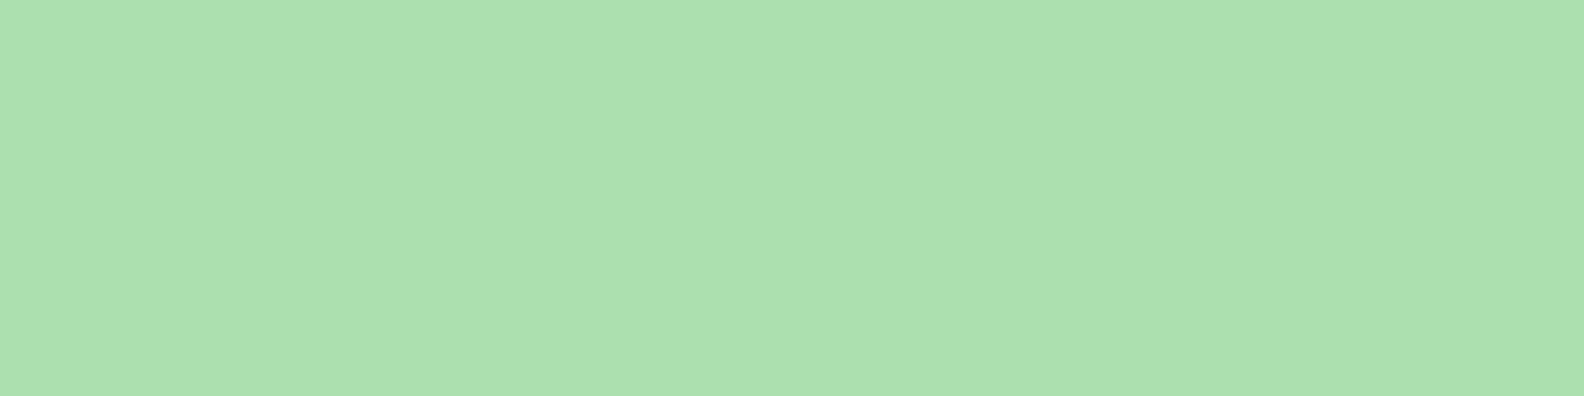 1584x396 Celadon Solid Color Background